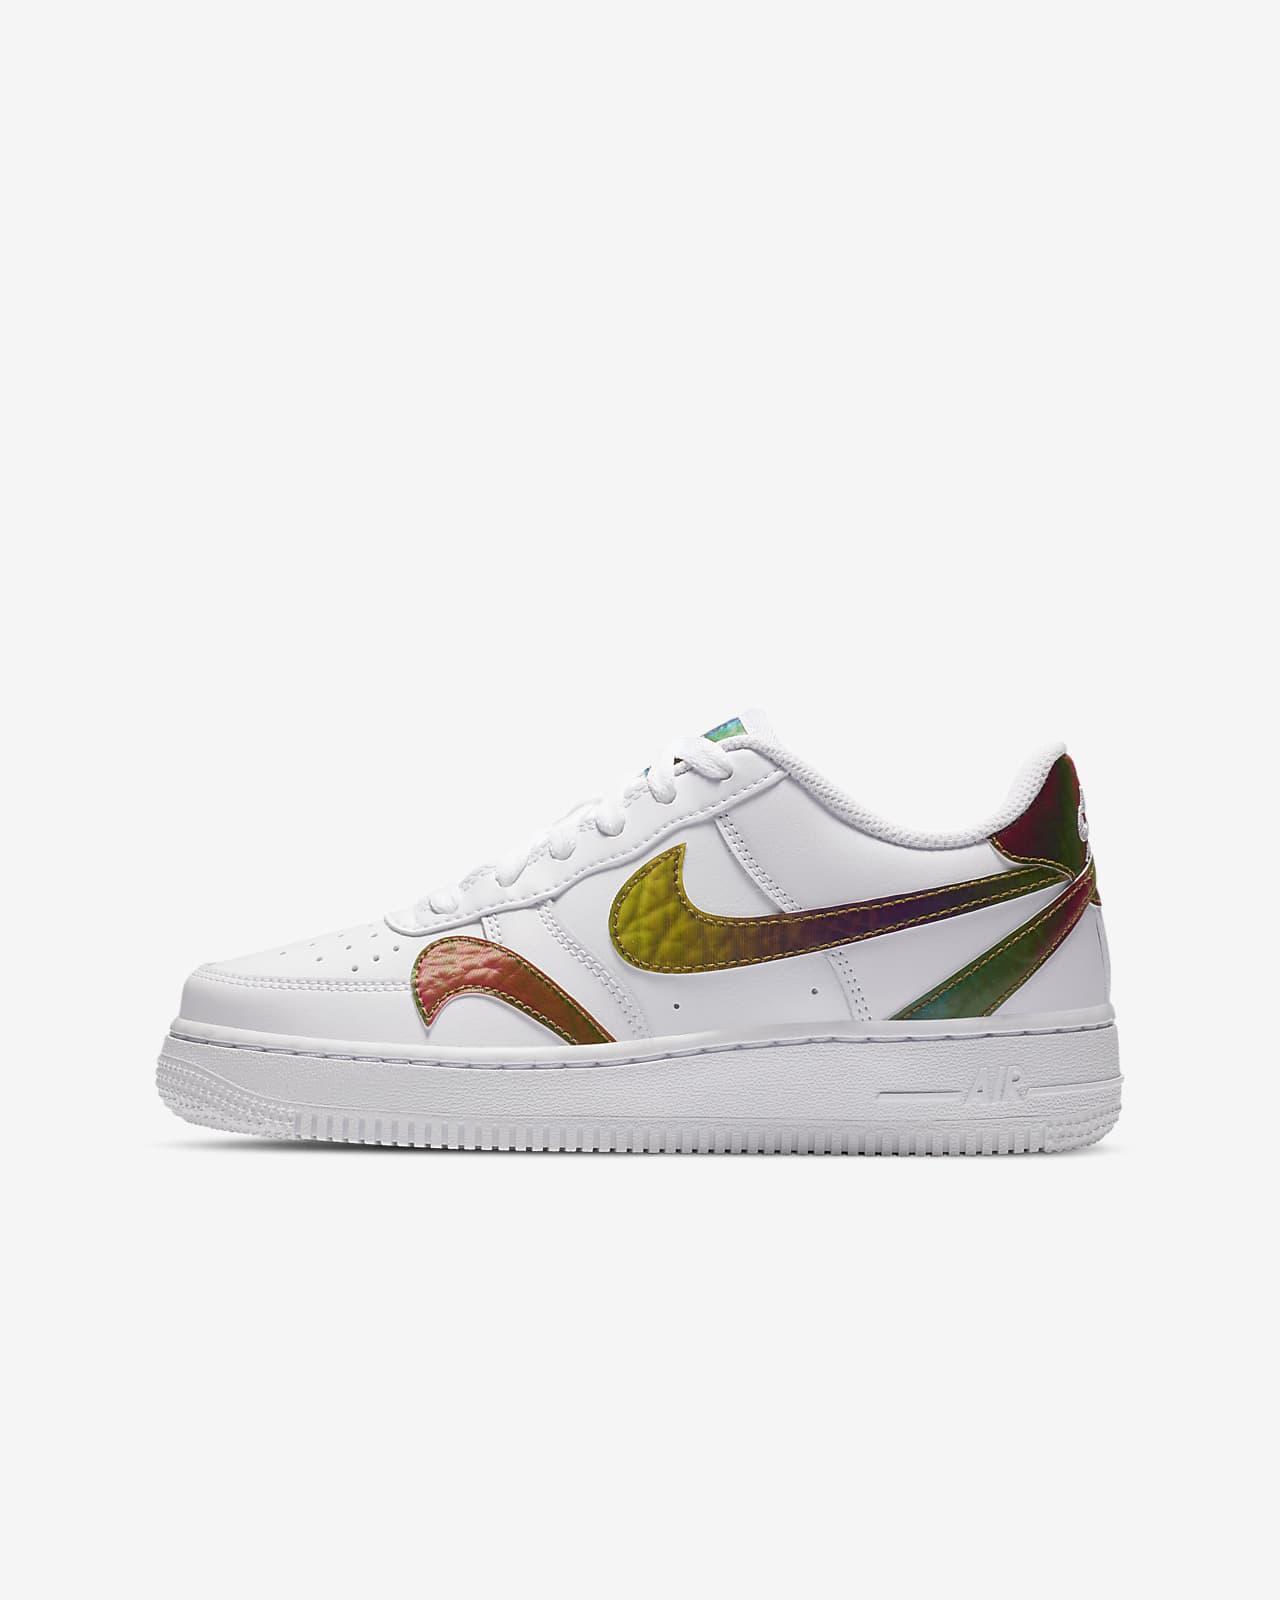 Nike Air Force 1 LV8 2 Kinderschoen